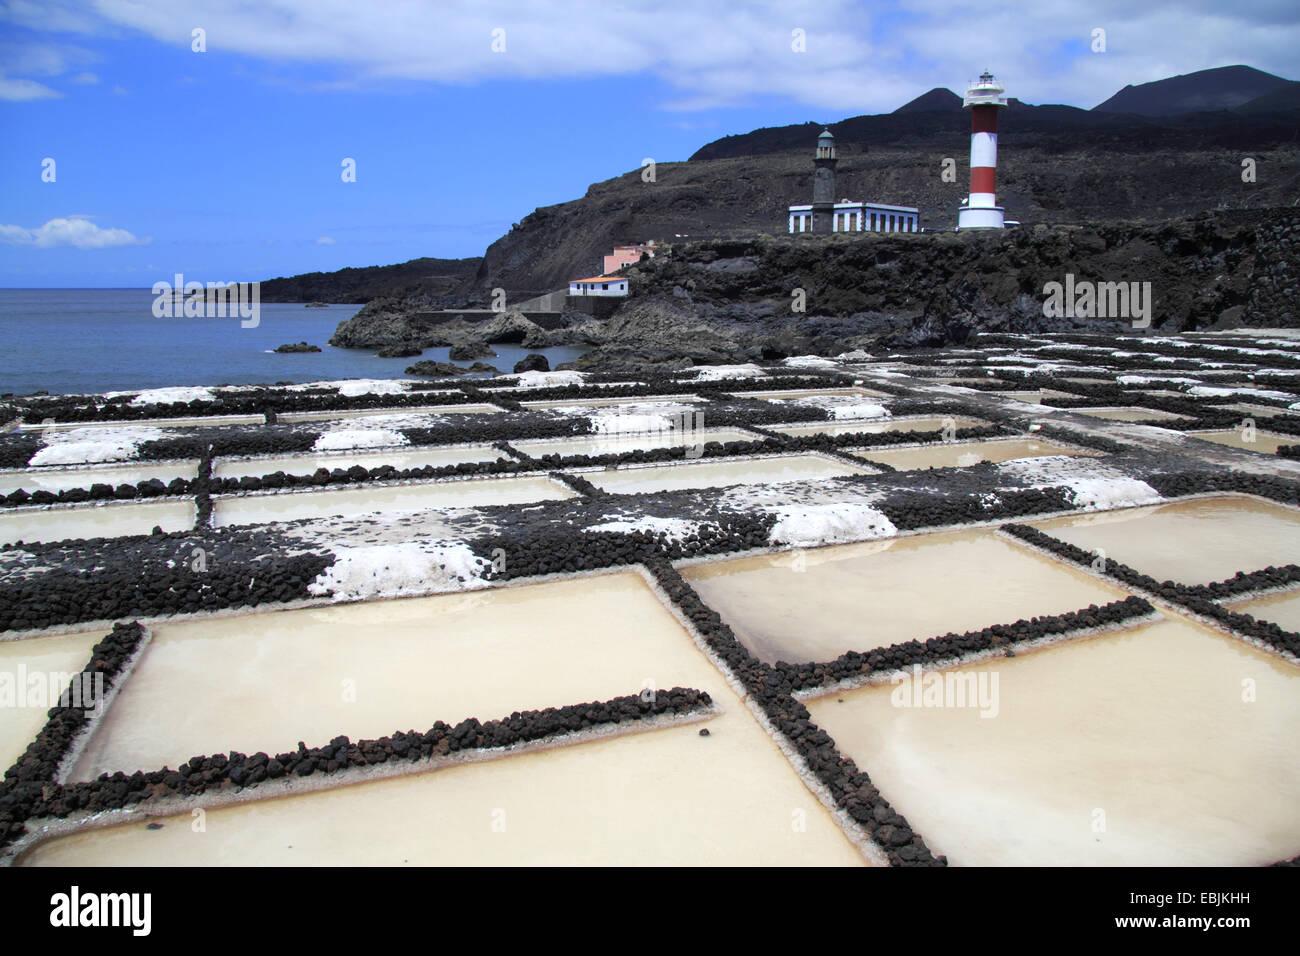 saline and lighthouse, Canary Islands, La Palma, Punta de Fuencaliente - Stock Image